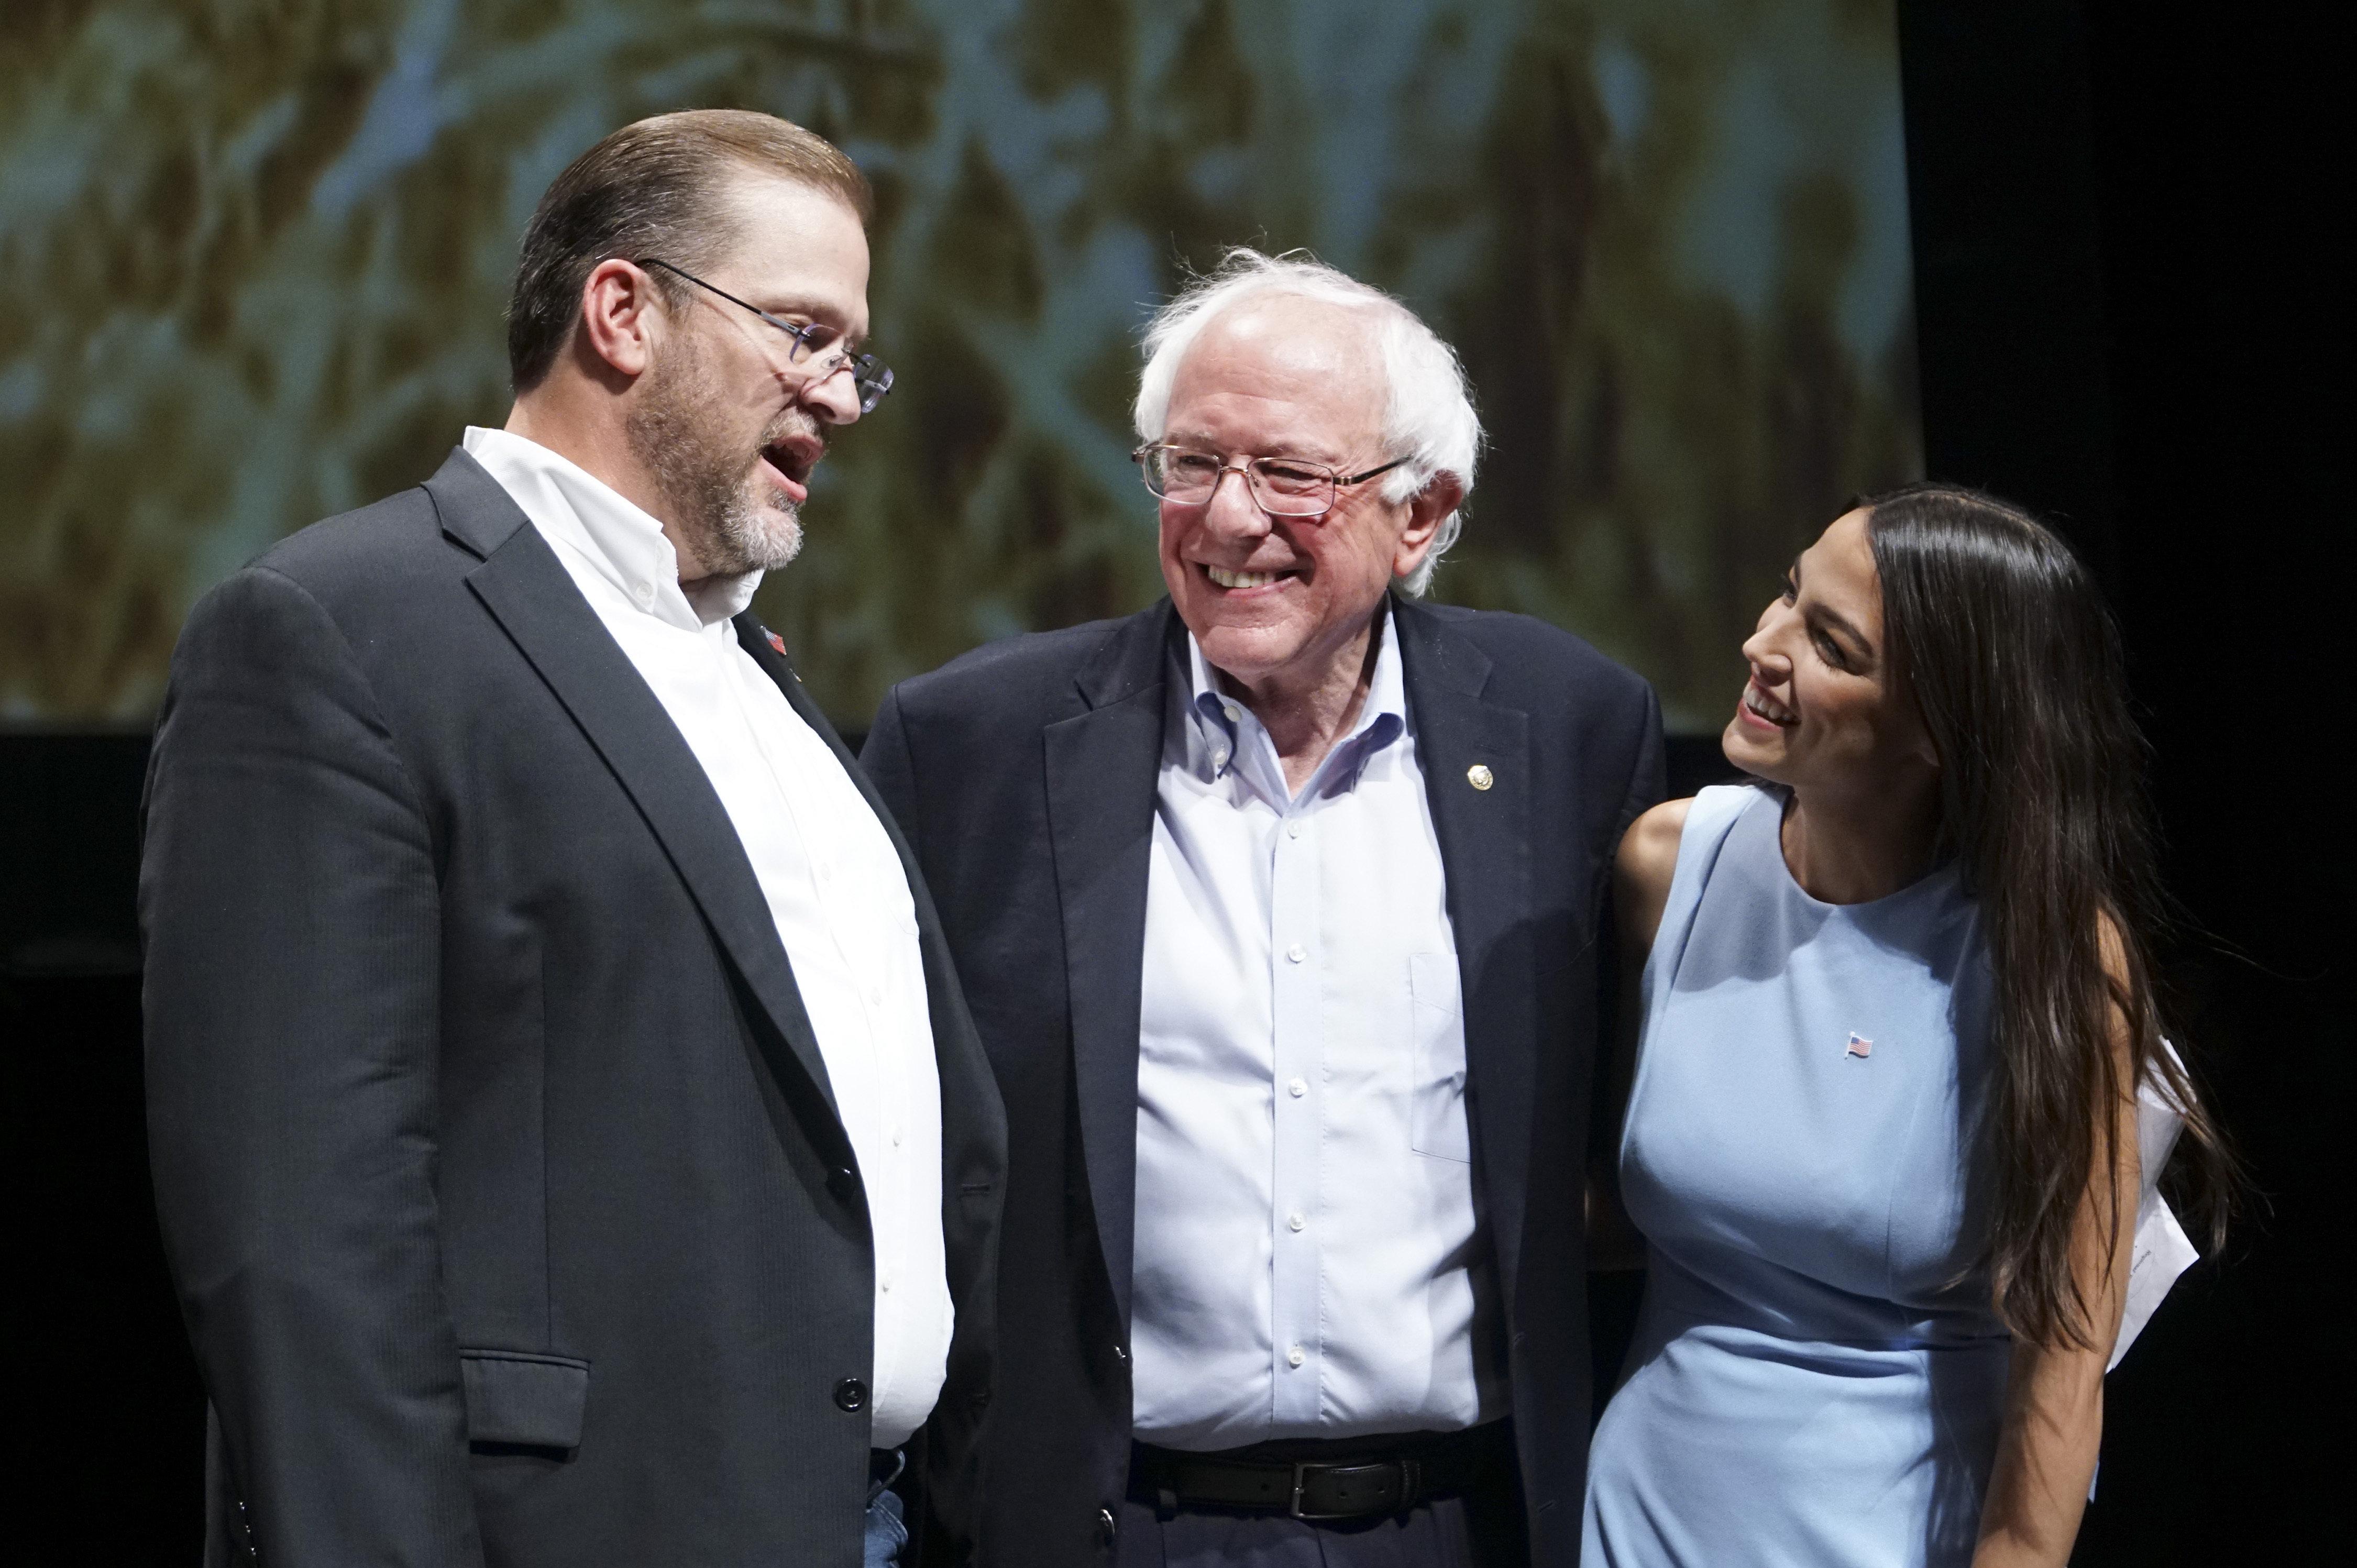 Kansas congressional candidate James Thompson with Sen. Bernie Sanders (I-Vt.) and Alexandria Ocasio-Cortez, a Democratic con